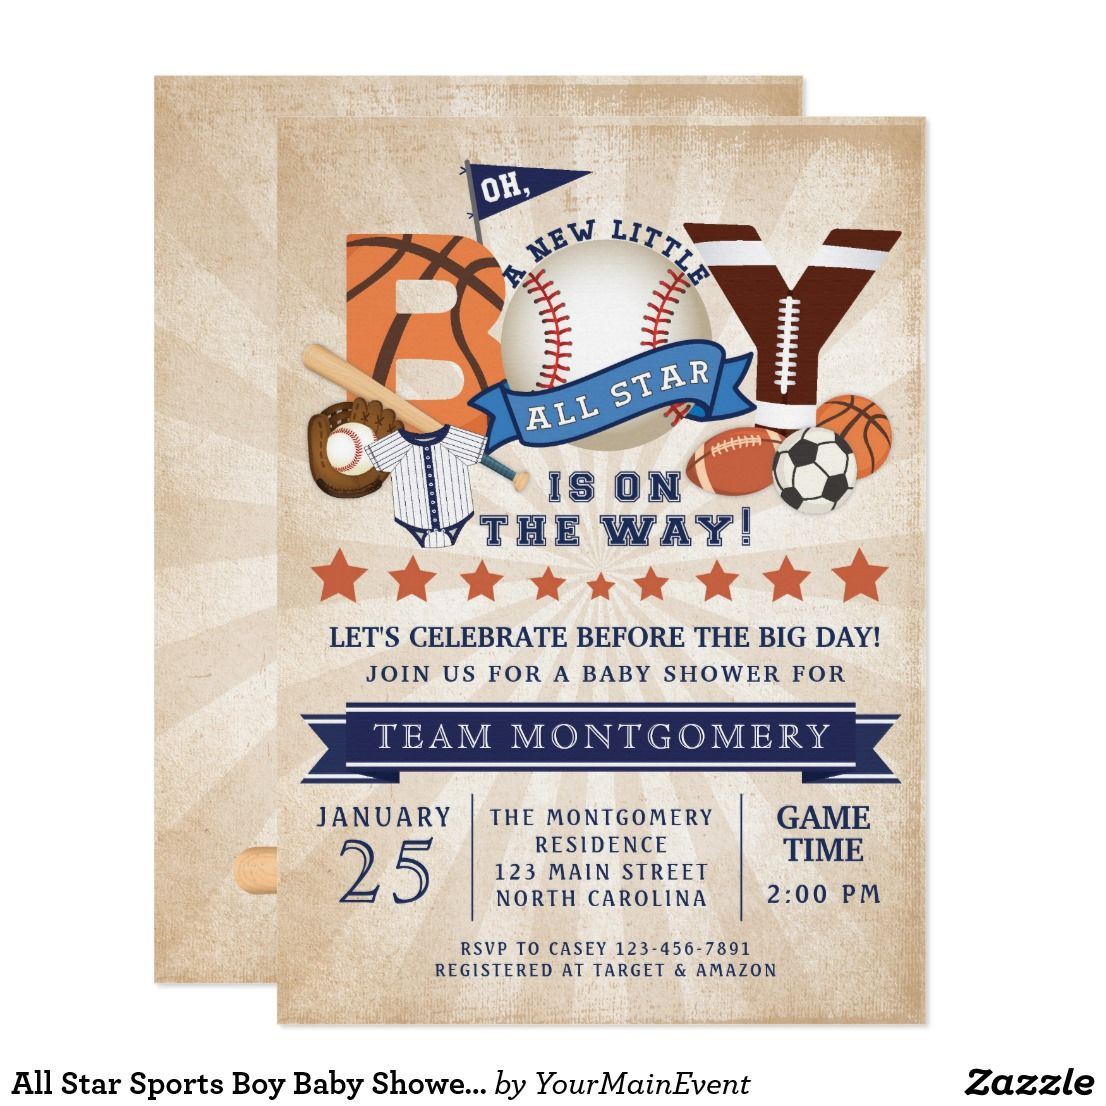 All Star Sports Boy Baby Shower Invitation   Baby Shower Invitations ...